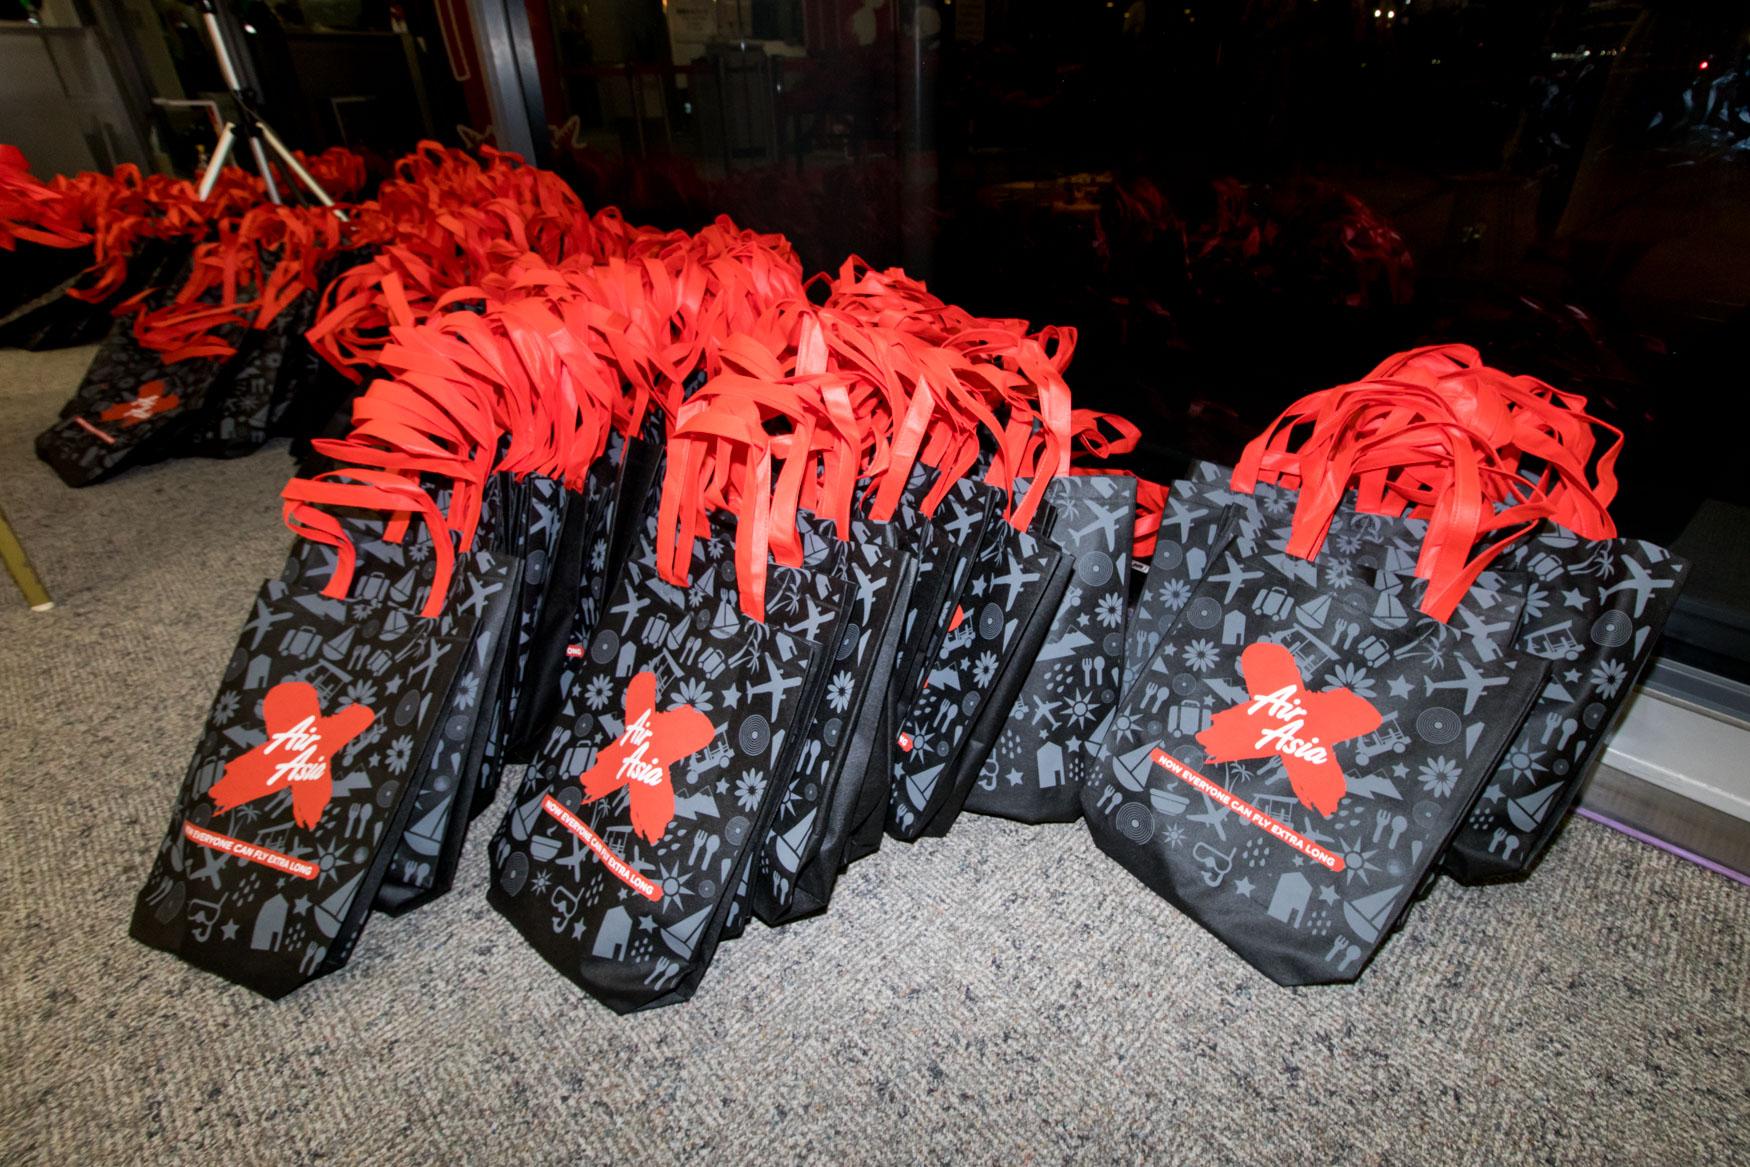 AirAsia X Inaugural Gift Bag